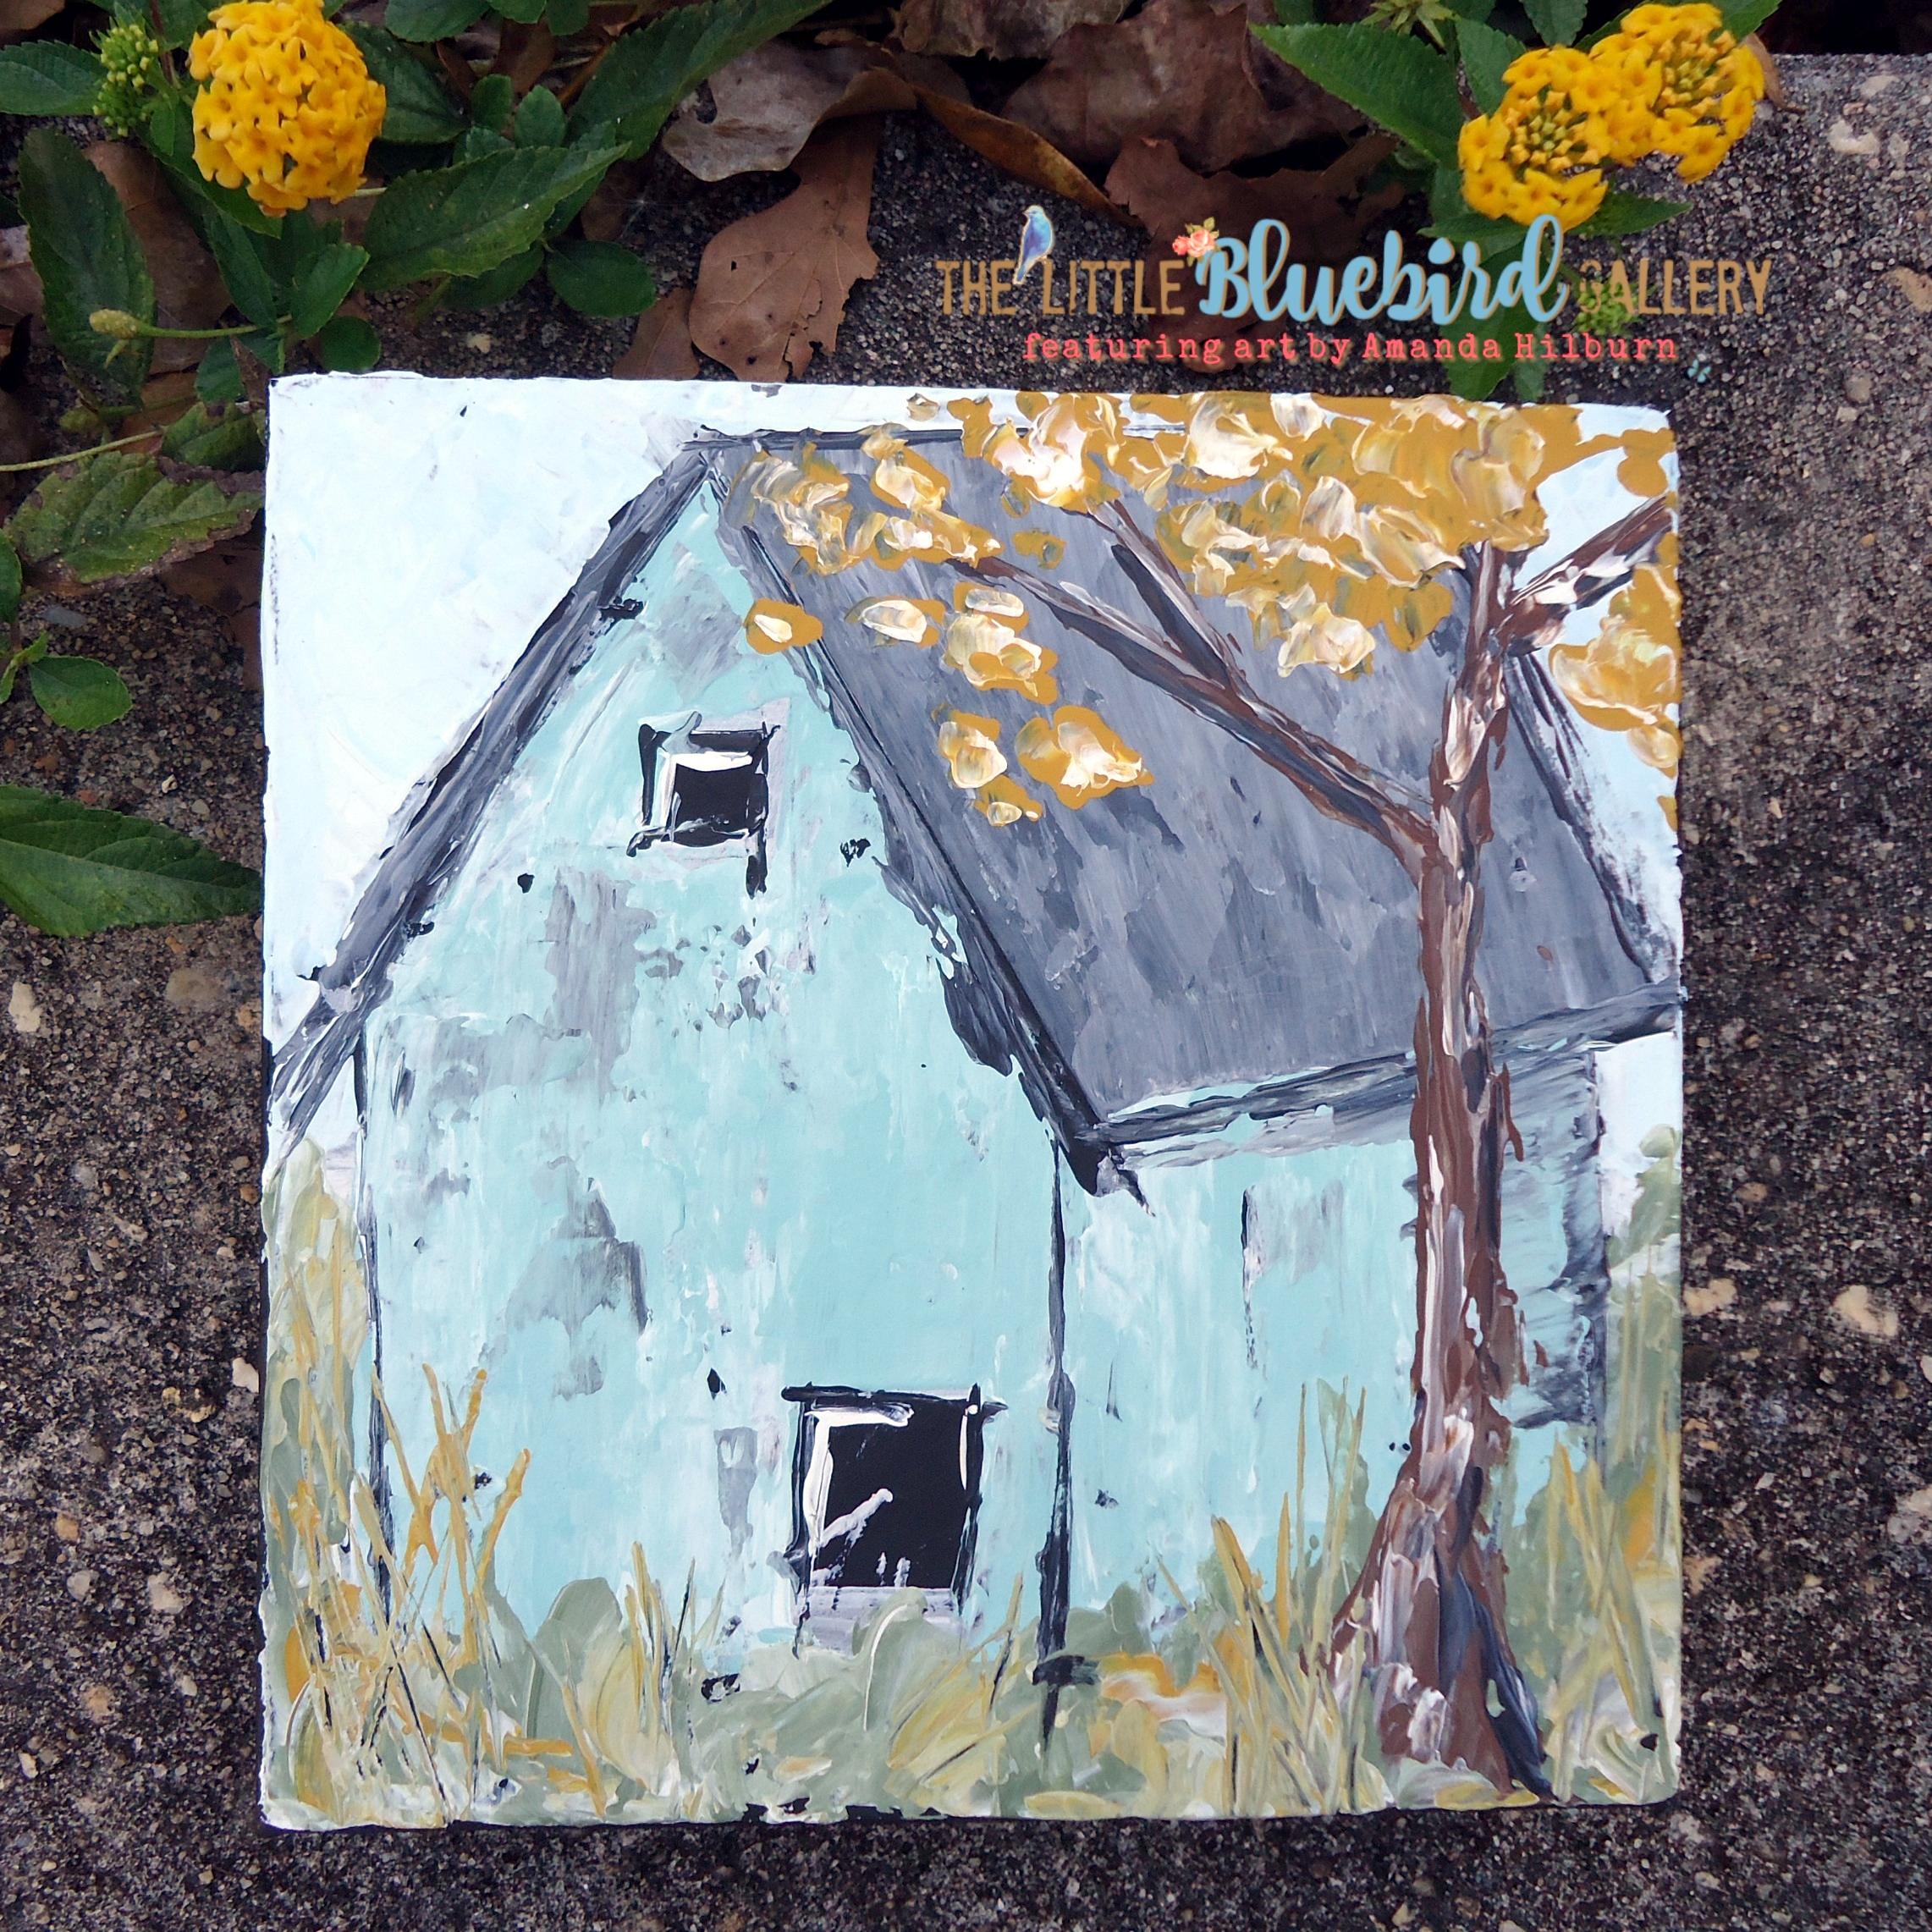 Fall Barn is an original acrylic painting by Amanda Hilburn. Get this one of a kind artwork at The Little Bluebird Gallery | Art by Amanda Hilburn #barn #turquoisebarn #farmhouse